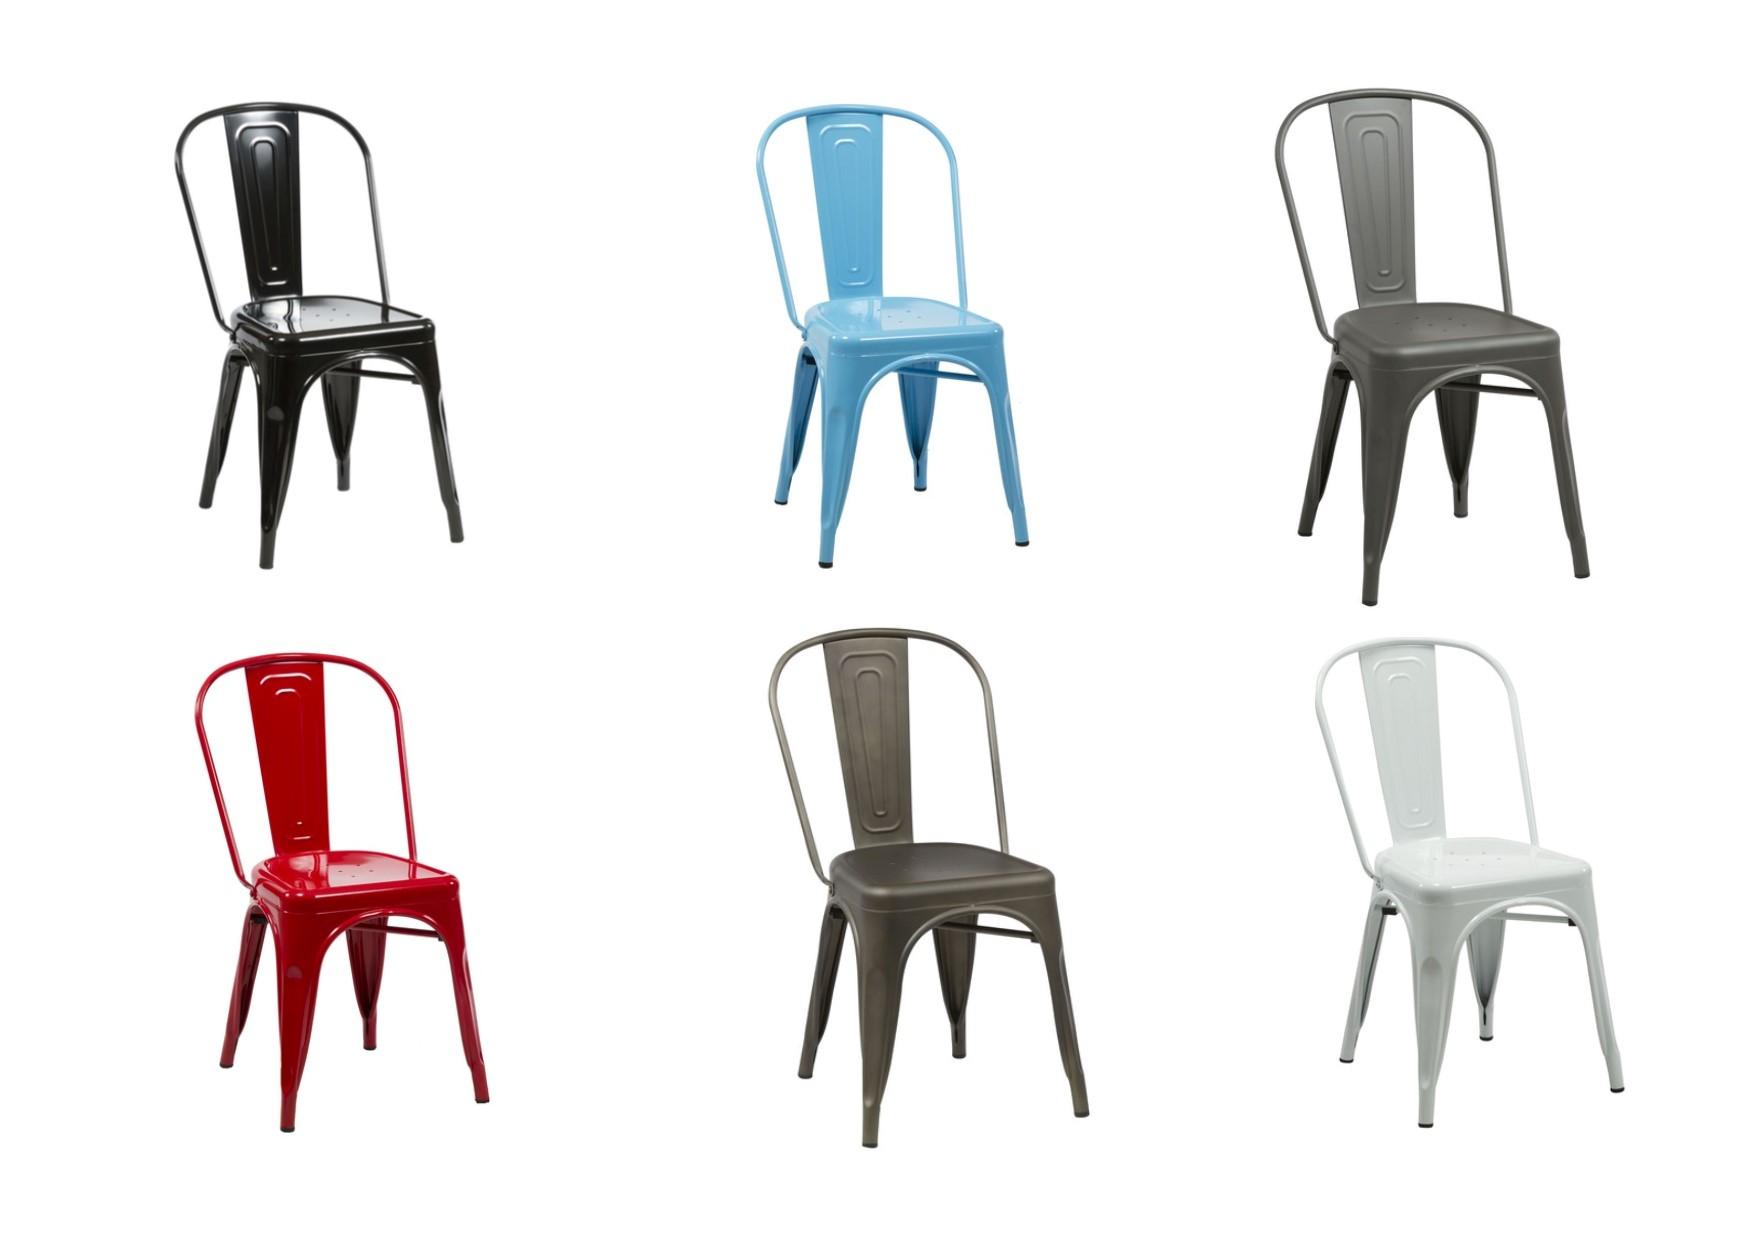 birlea vasper retro metal bistro chairs black white blue red